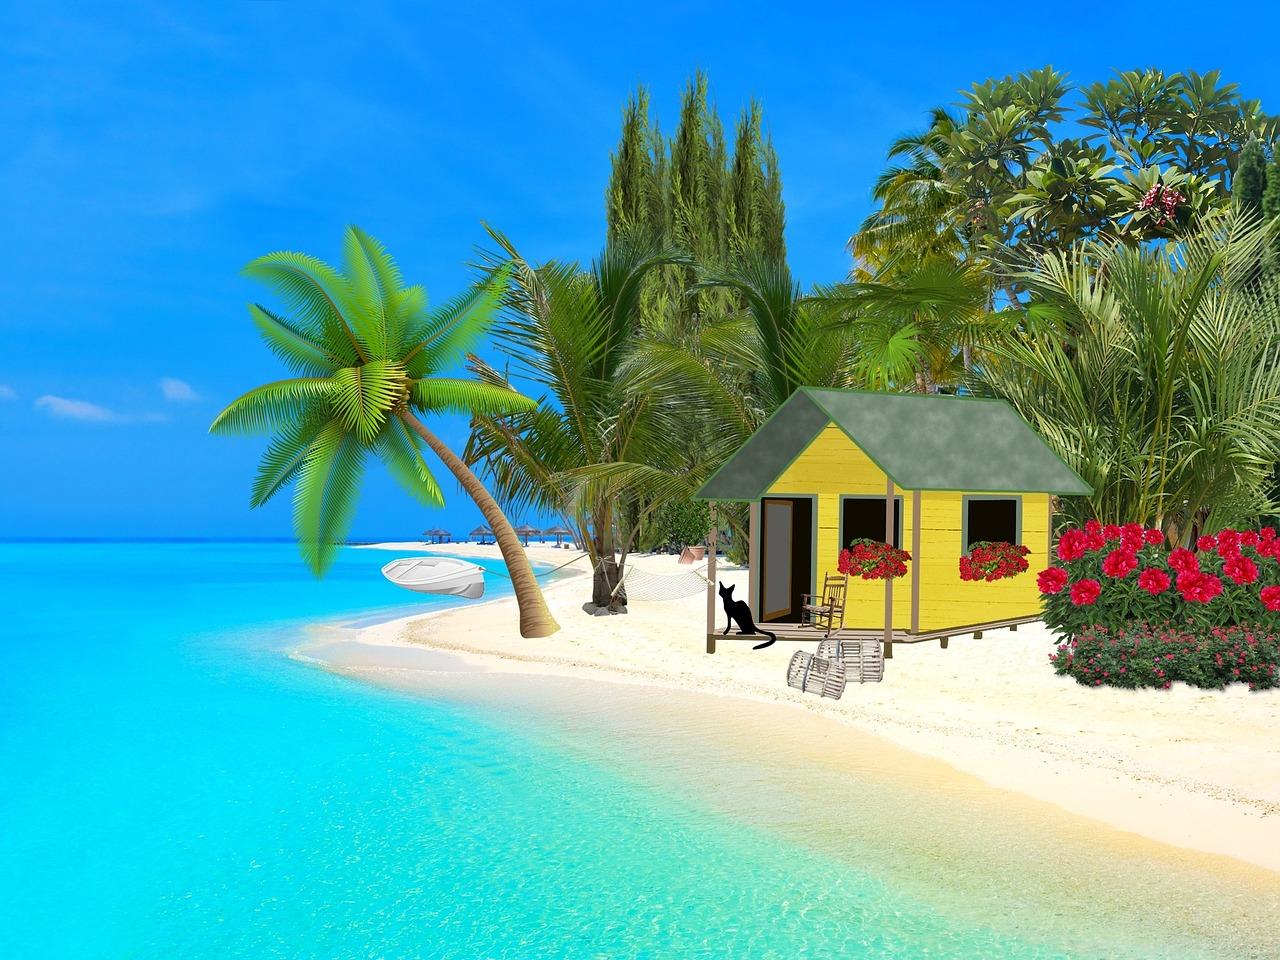 Domek na pláži